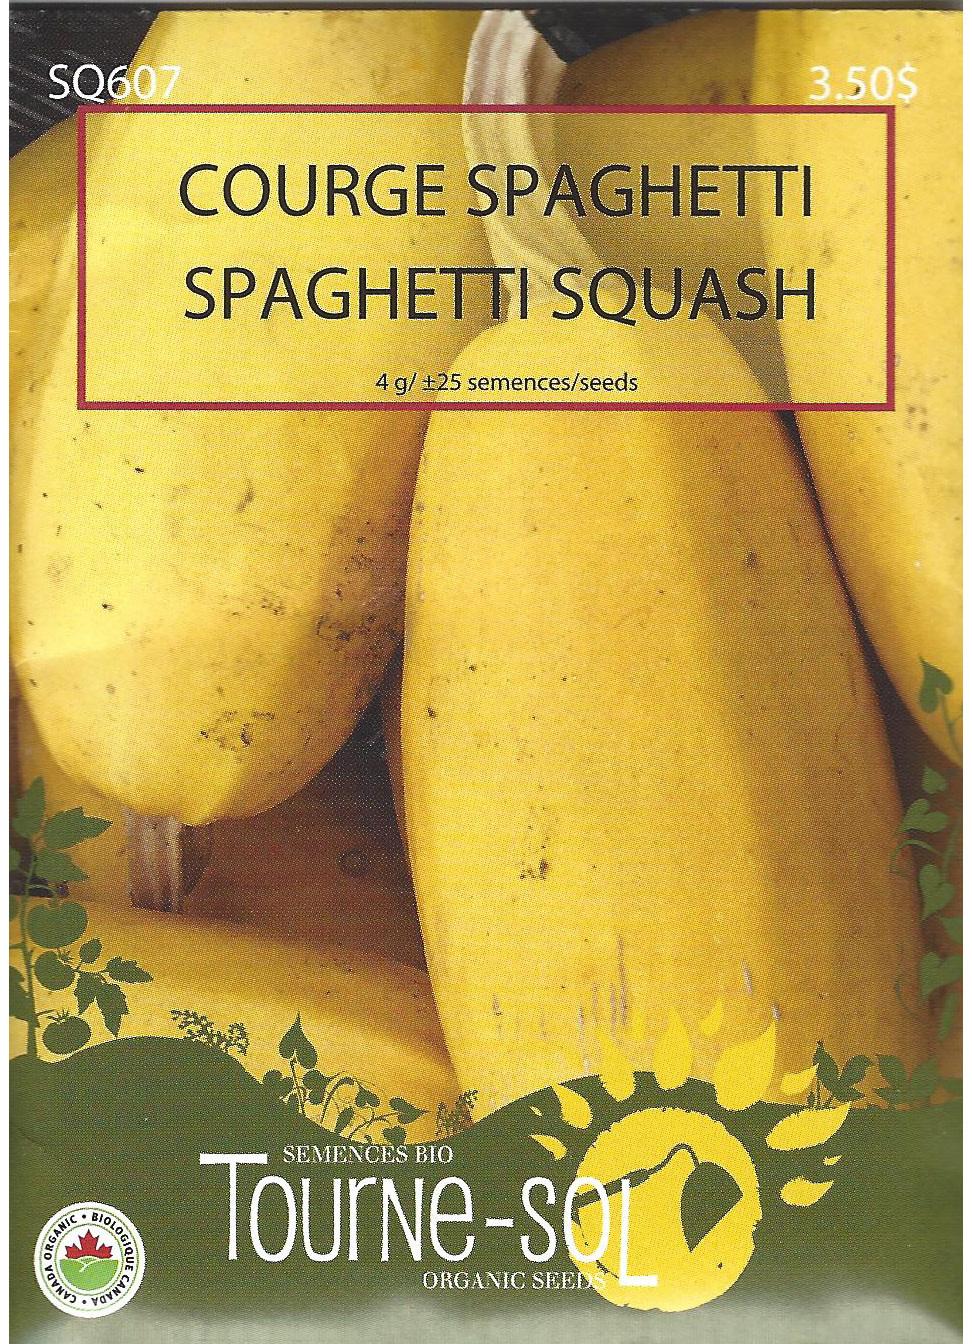 Semence Tourne-sol Courge Spaghetti